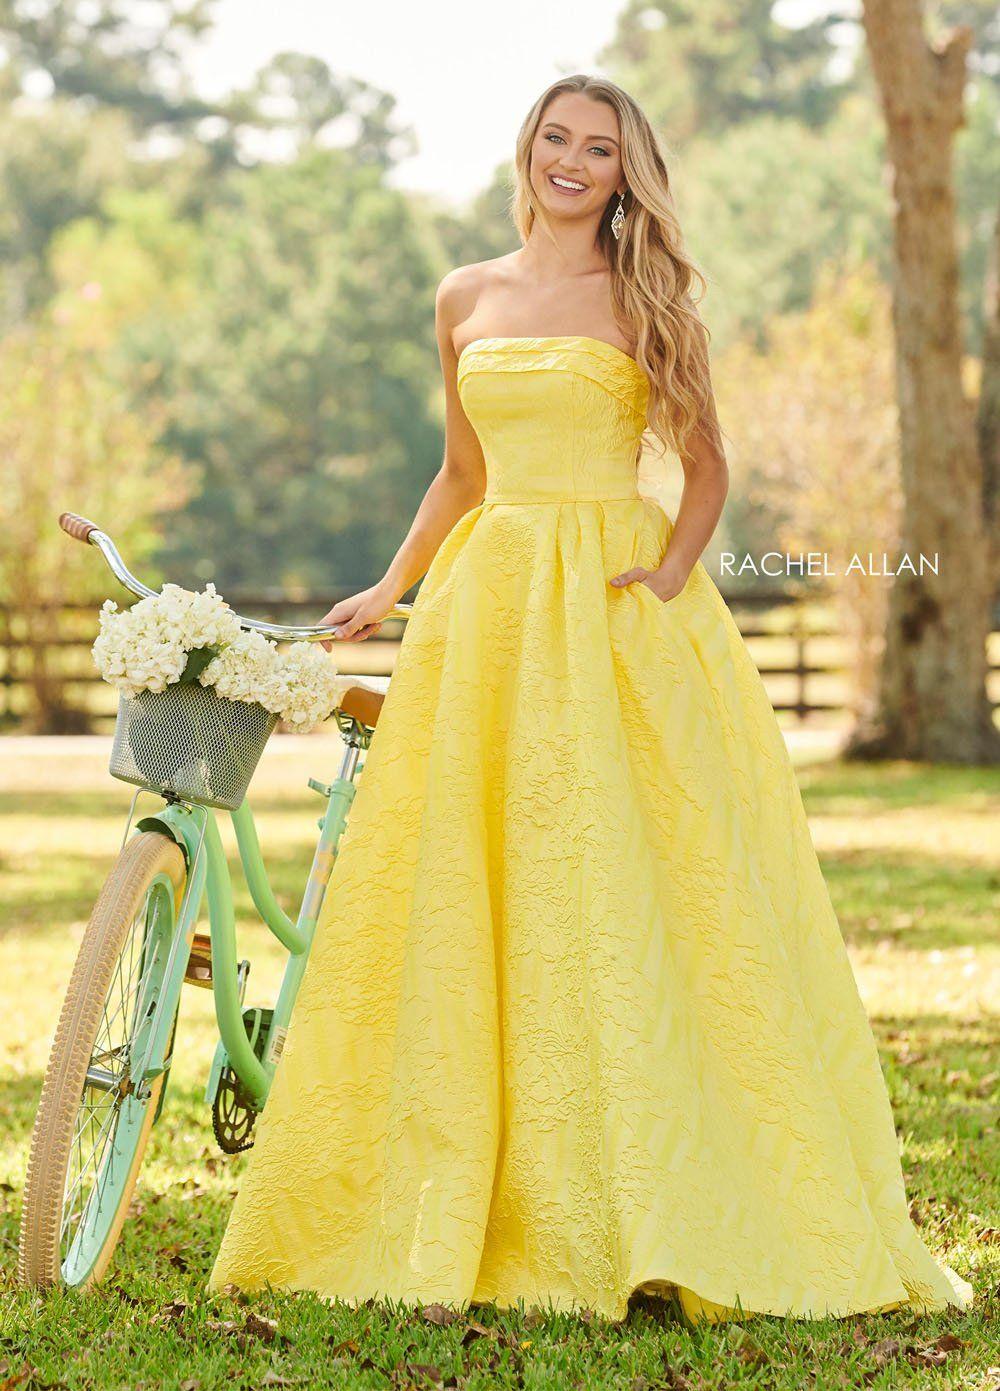 Rachel Allan 7013 Dress In 2021 Prom Dresses Yellow Rachel Allan Dresses Ball Gown Dresses [ 1391 x 1000 Pixel ]